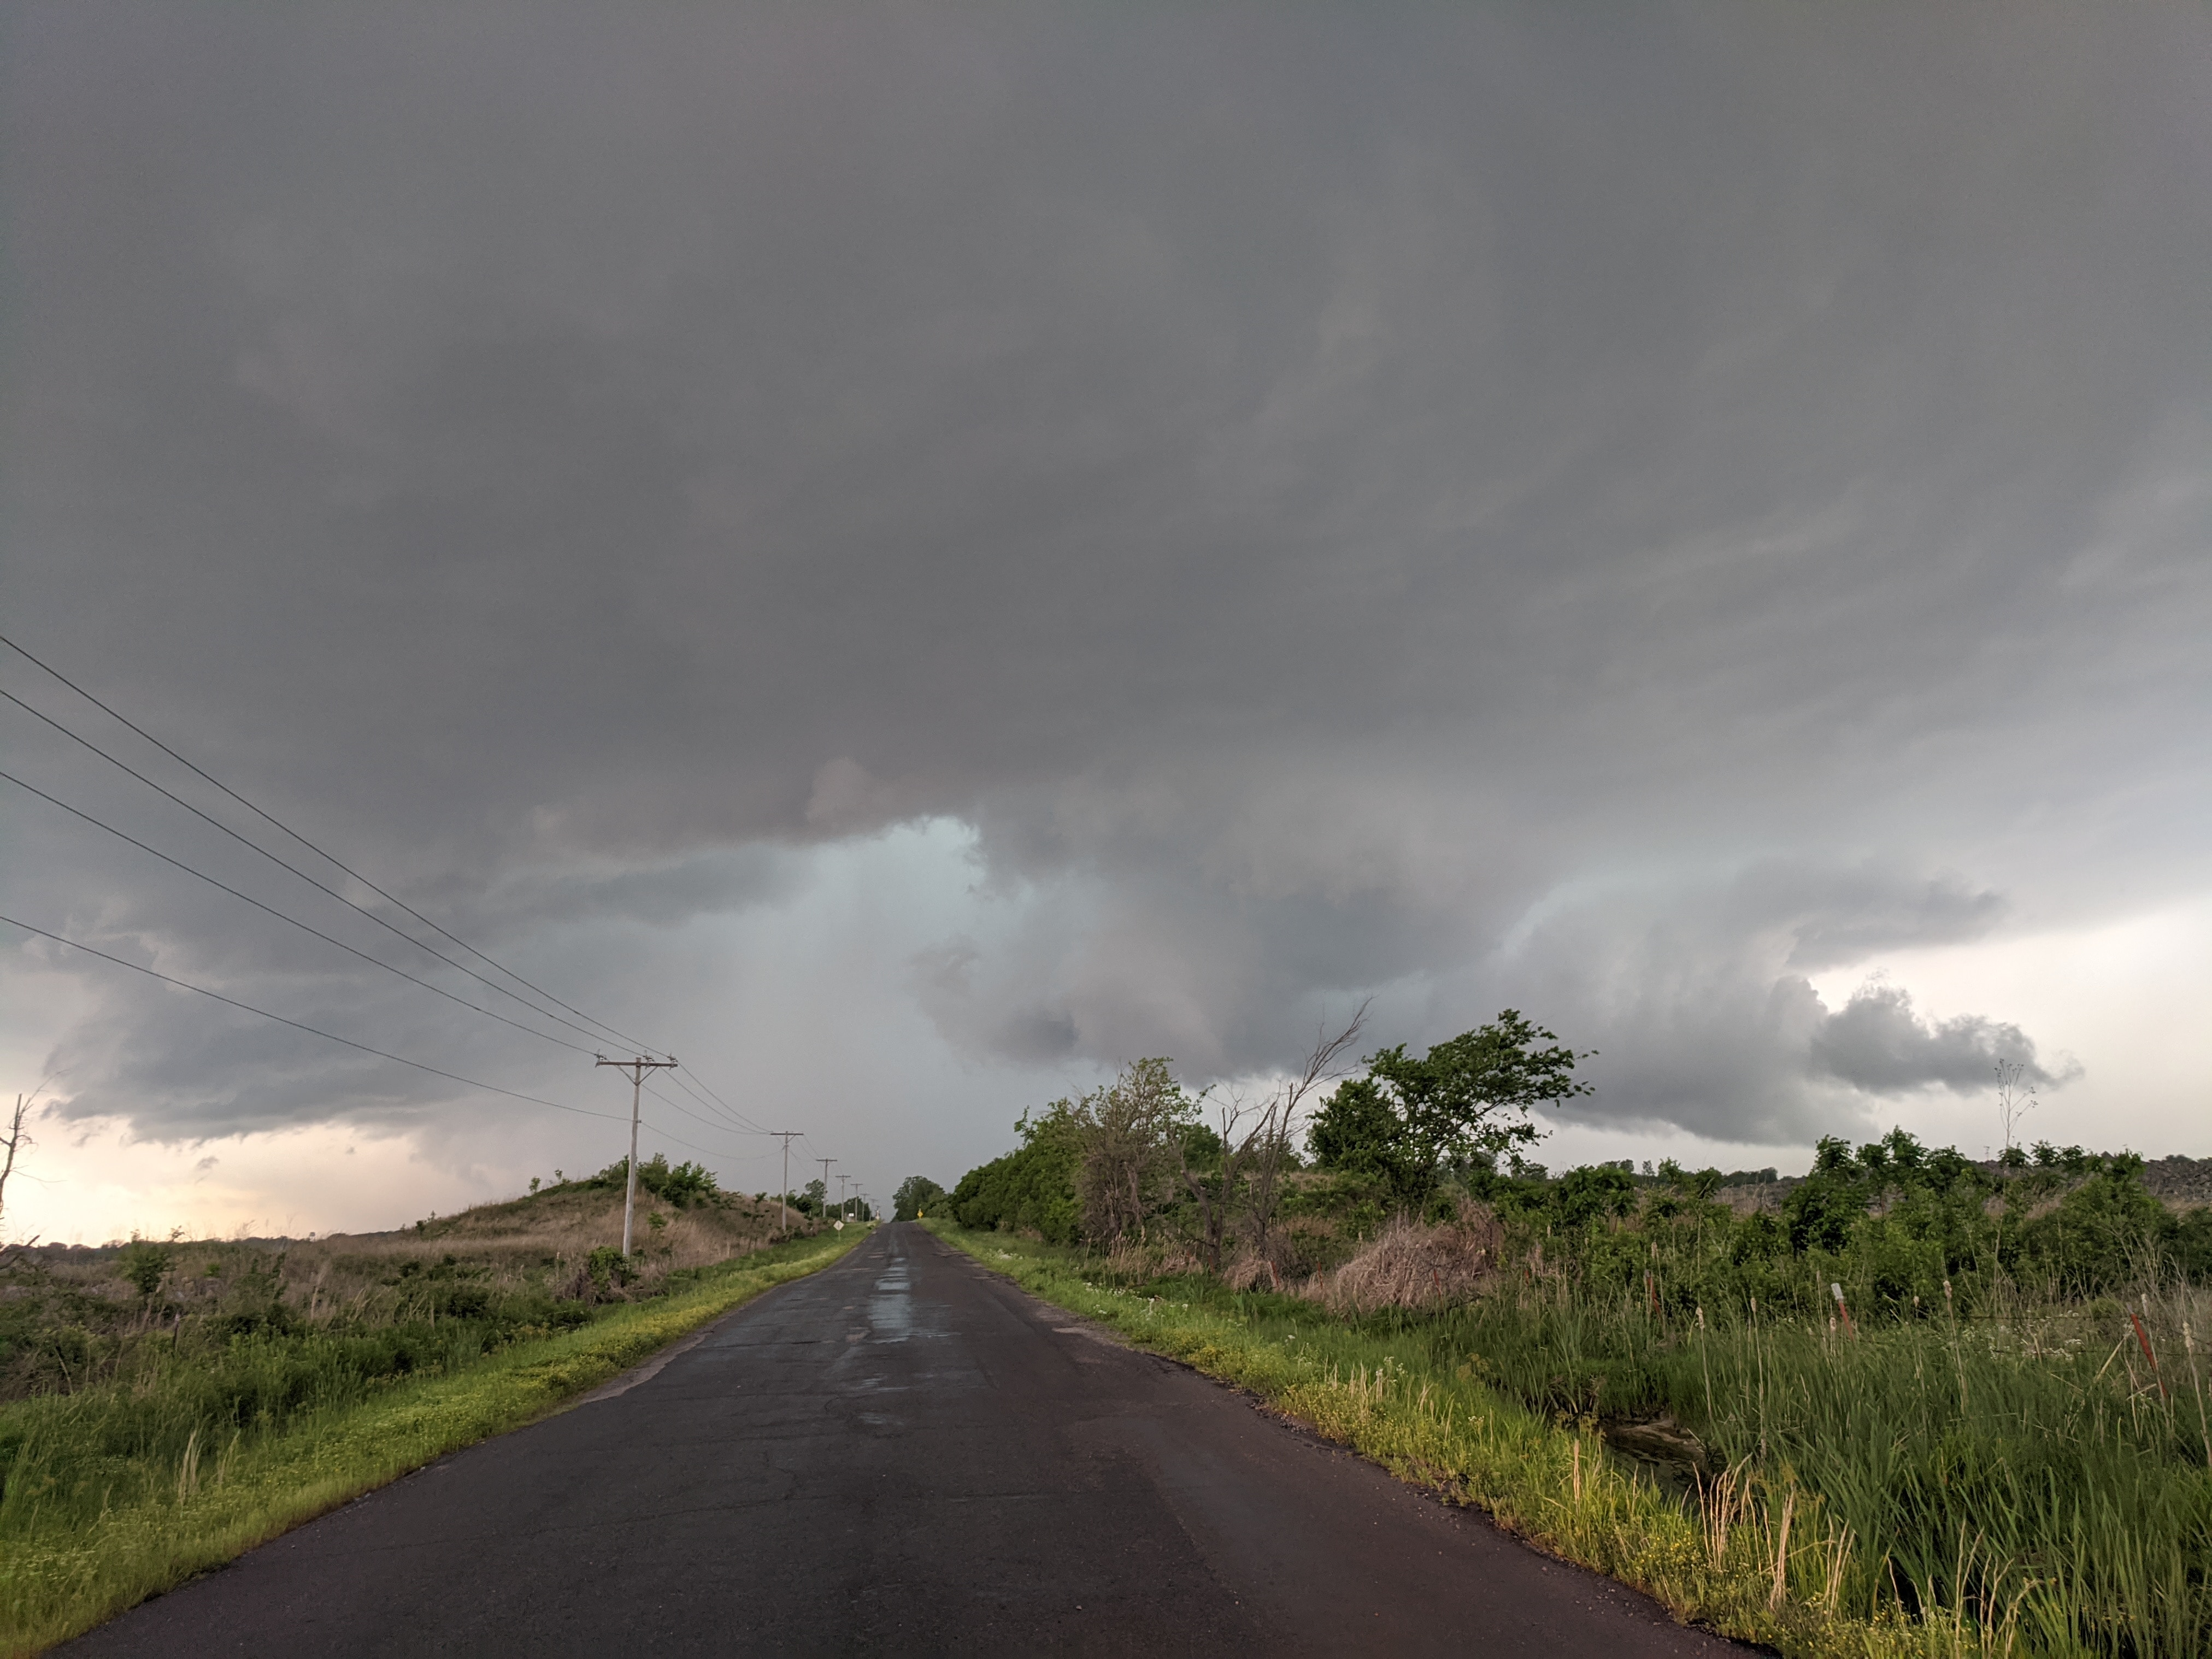 Supercell thunderstorm near Pryor, Oklahoma